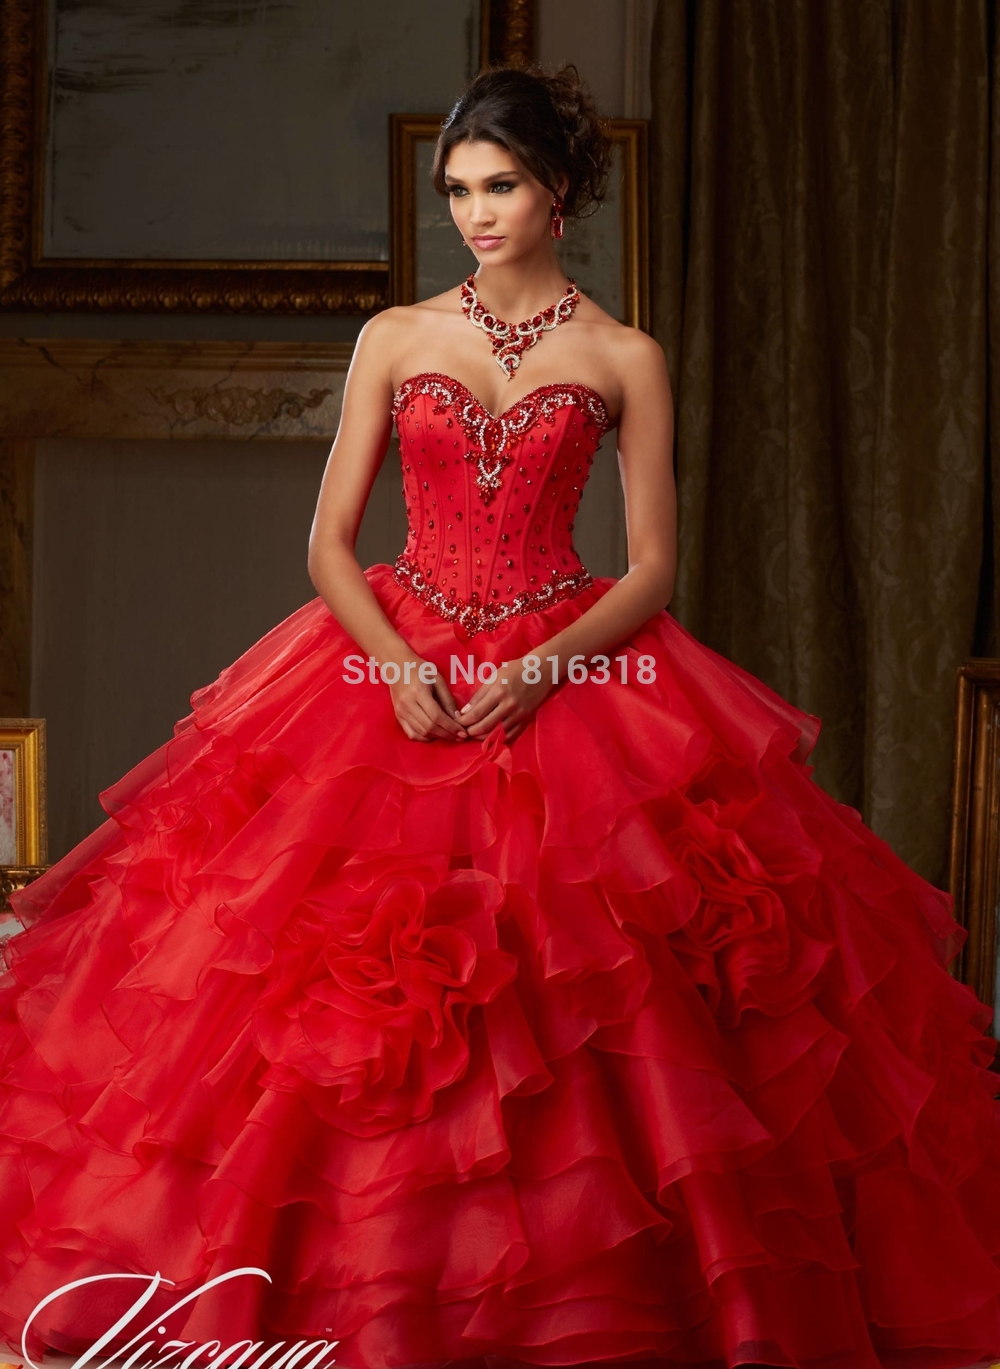 Vestidos Para Debutante Longo Red Quinceanera Dresses 2016 New Arrival Beaded Dress 15 Years To Birthday Party Vestido Soltinho Red Quinceanera Dresses Quinceanera Dresses 2016quinceanera Dresses Aliexpress